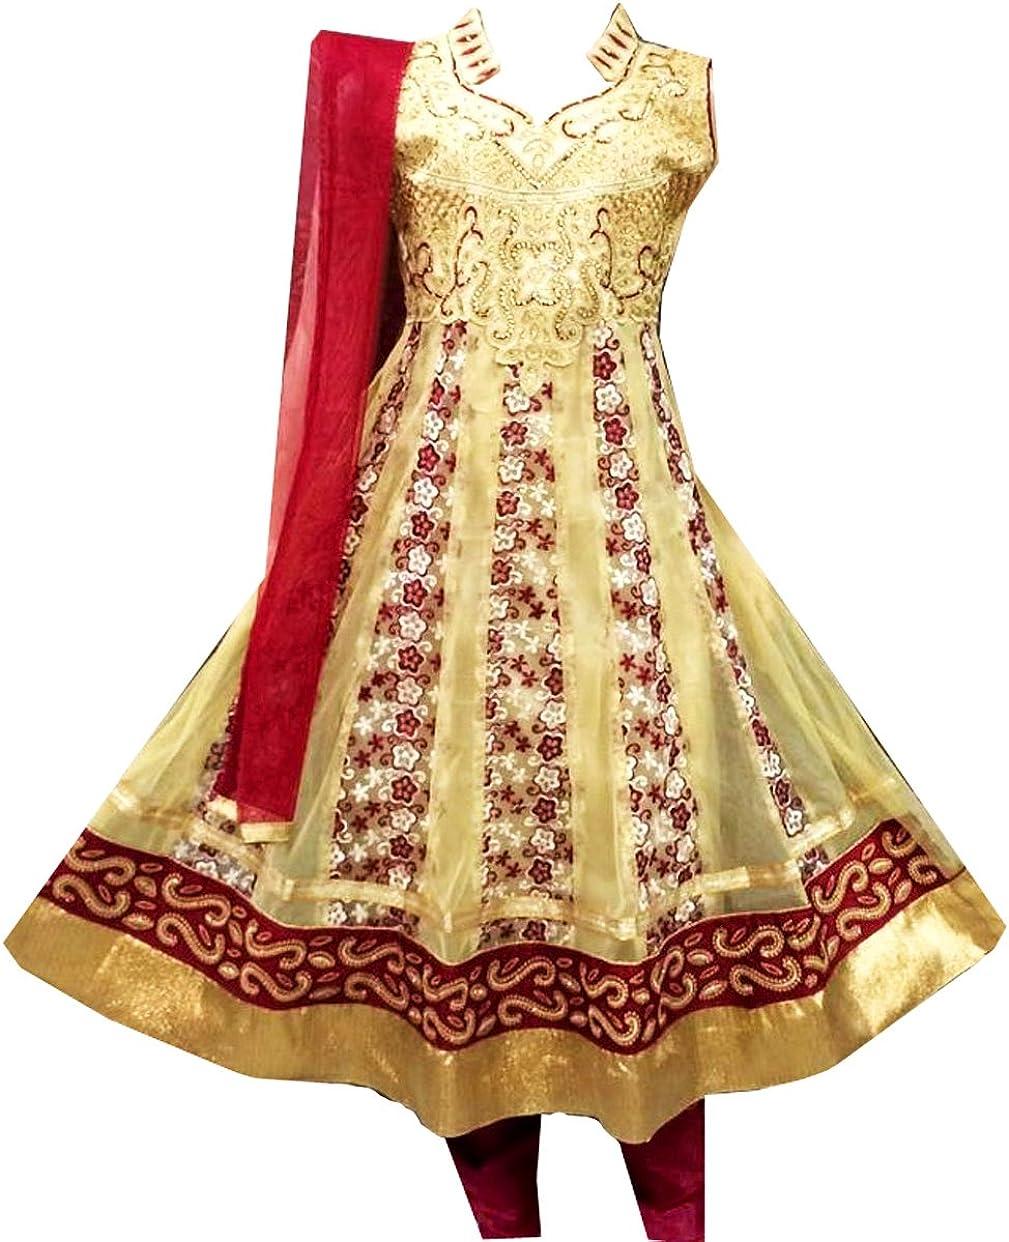 Zaffron Girls' Designer Golden Salwar Kameez Indian Party Dress Clothing with Colored Embroidery